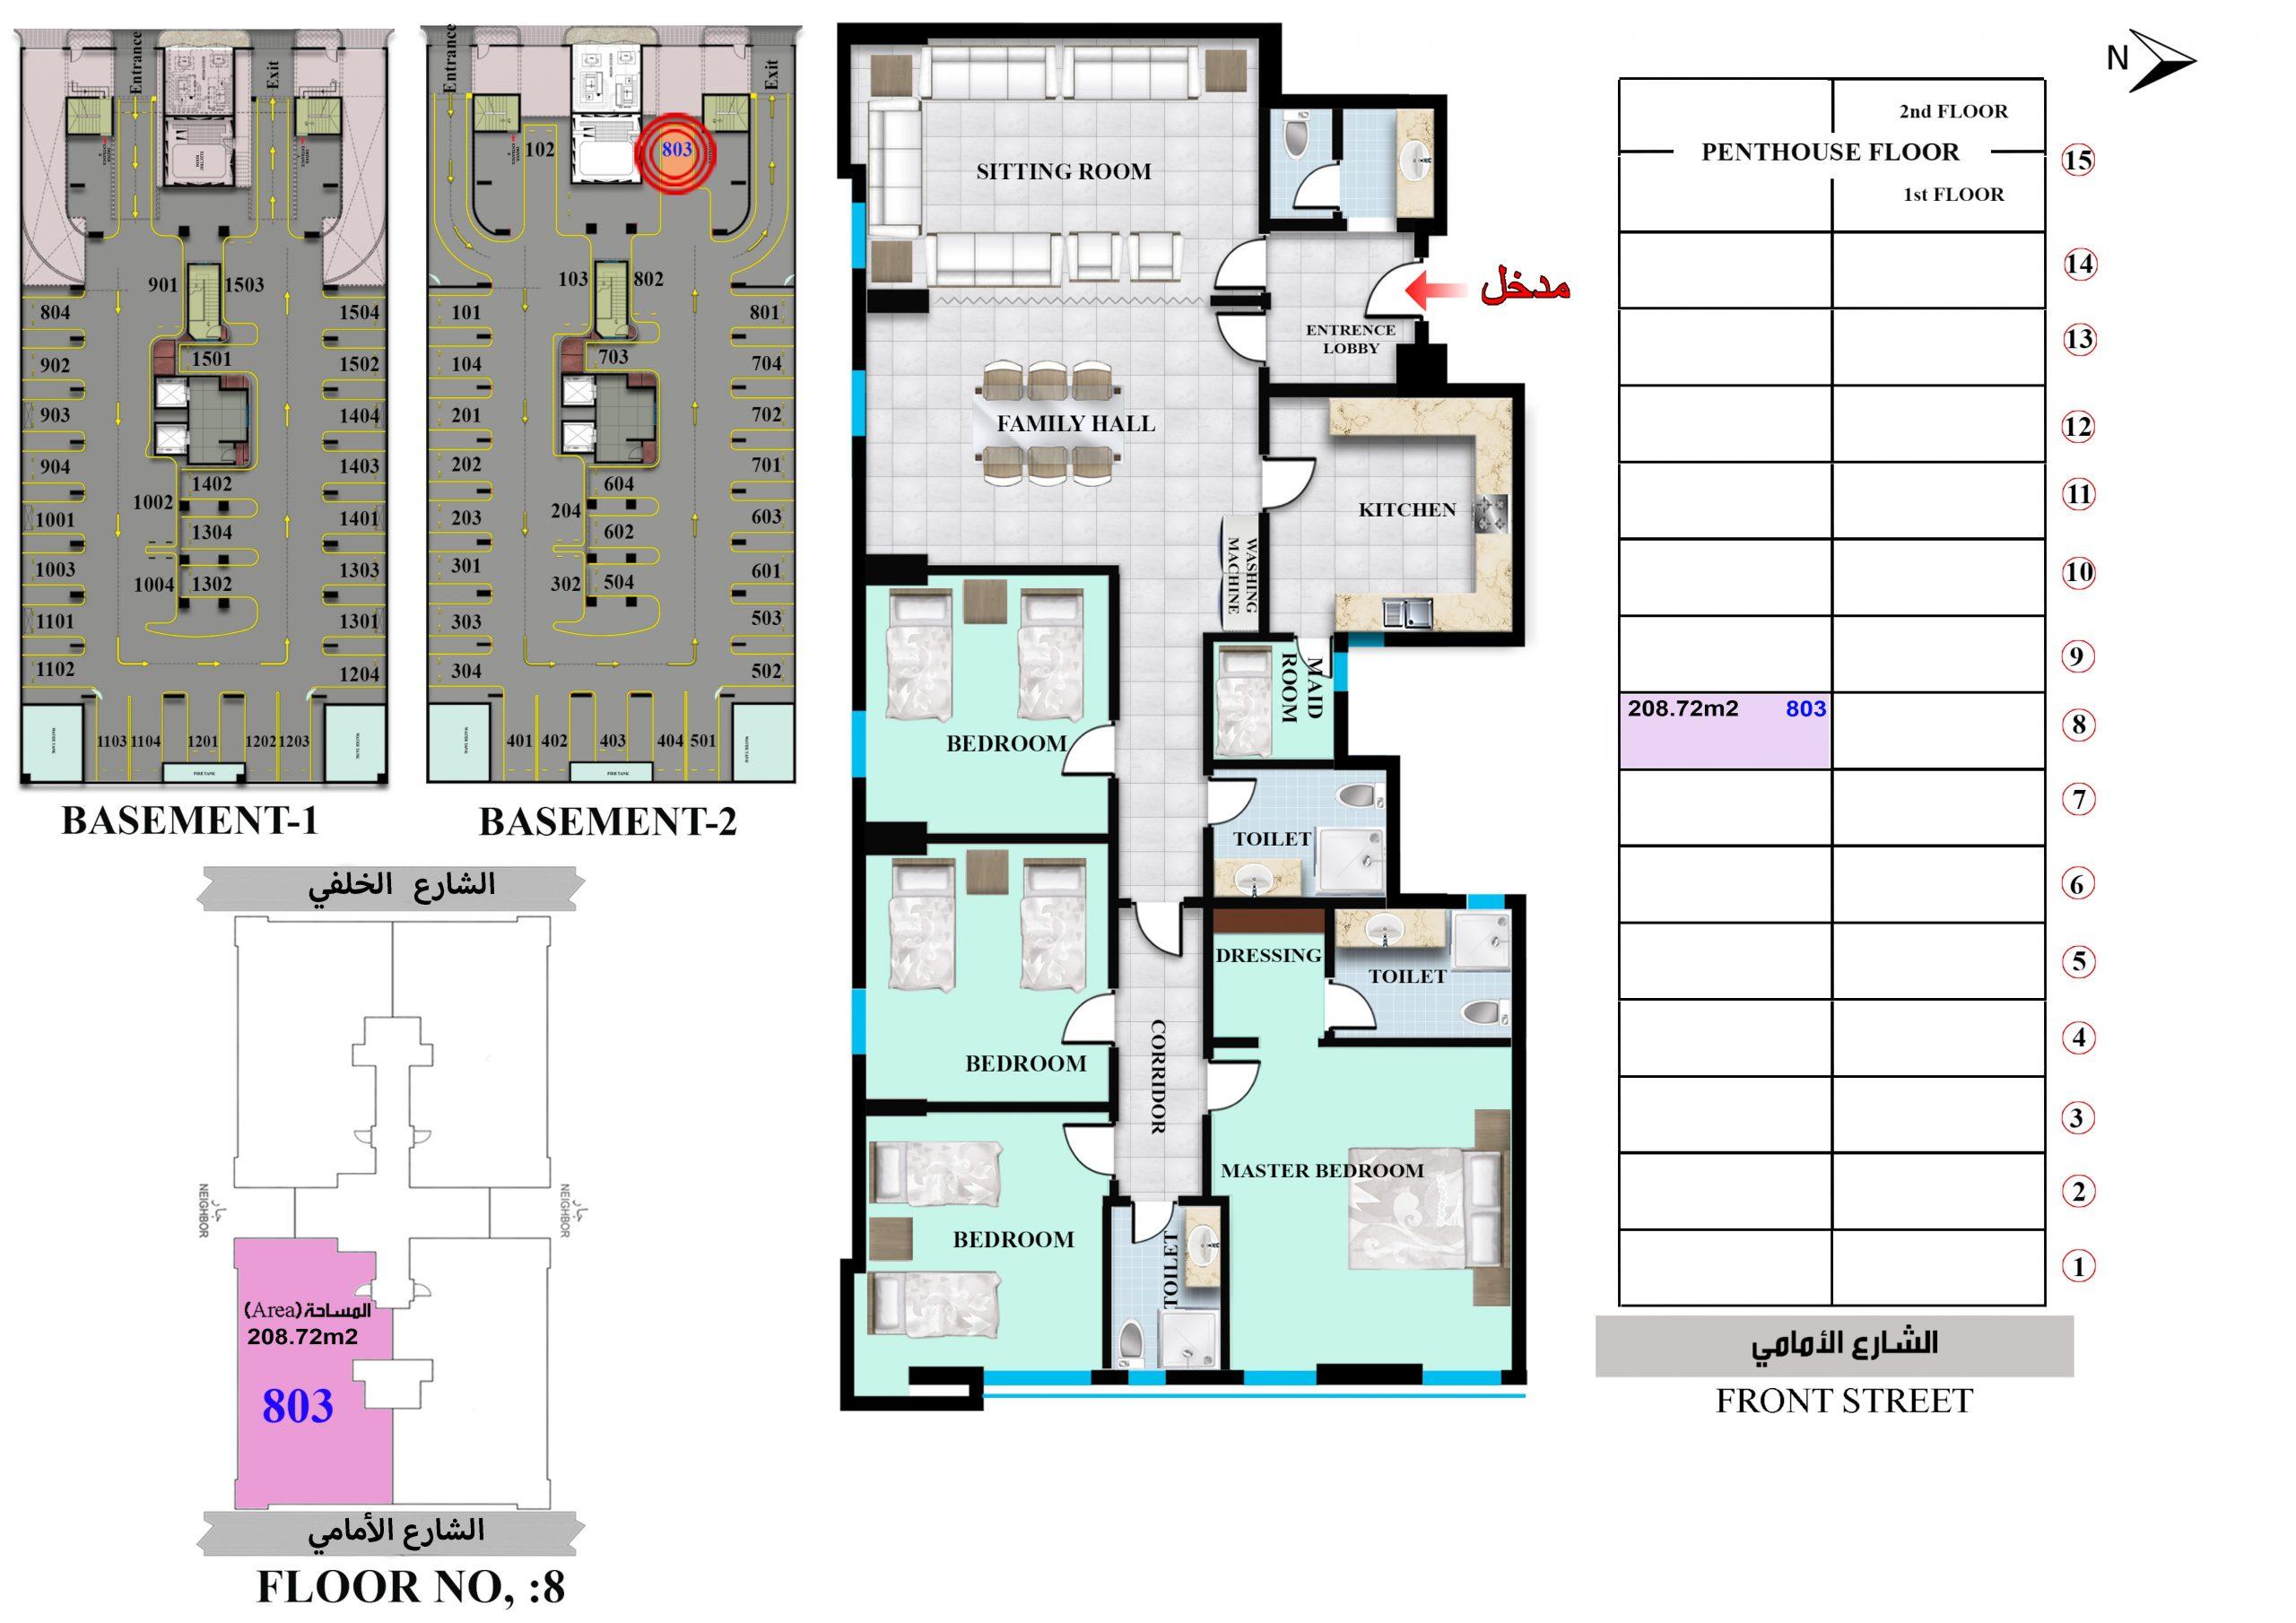 شقة رقم 803 (مباعة)